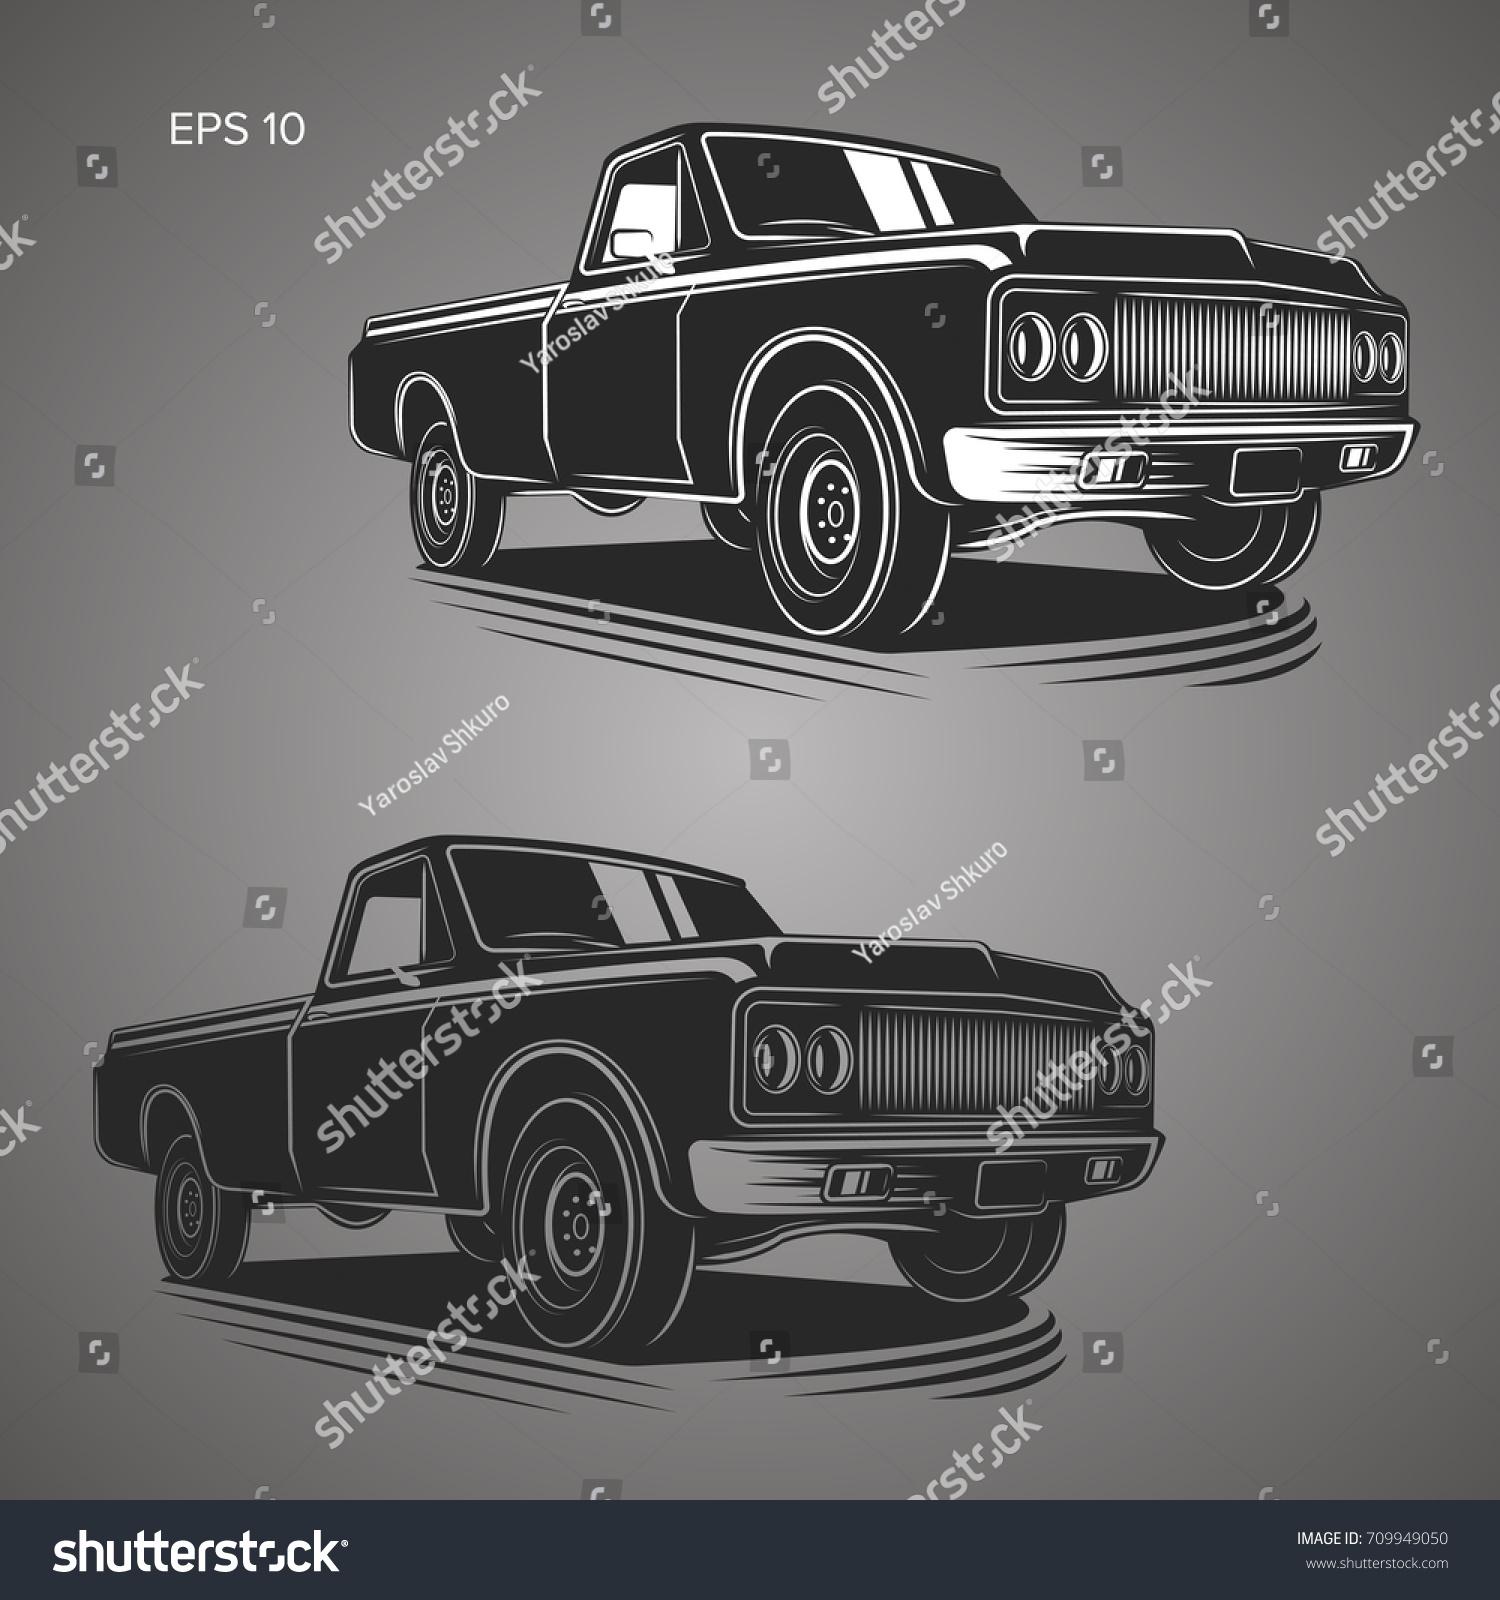 Vintage Pickup Truck Vector Illustration Oldschool Stock Vector ...